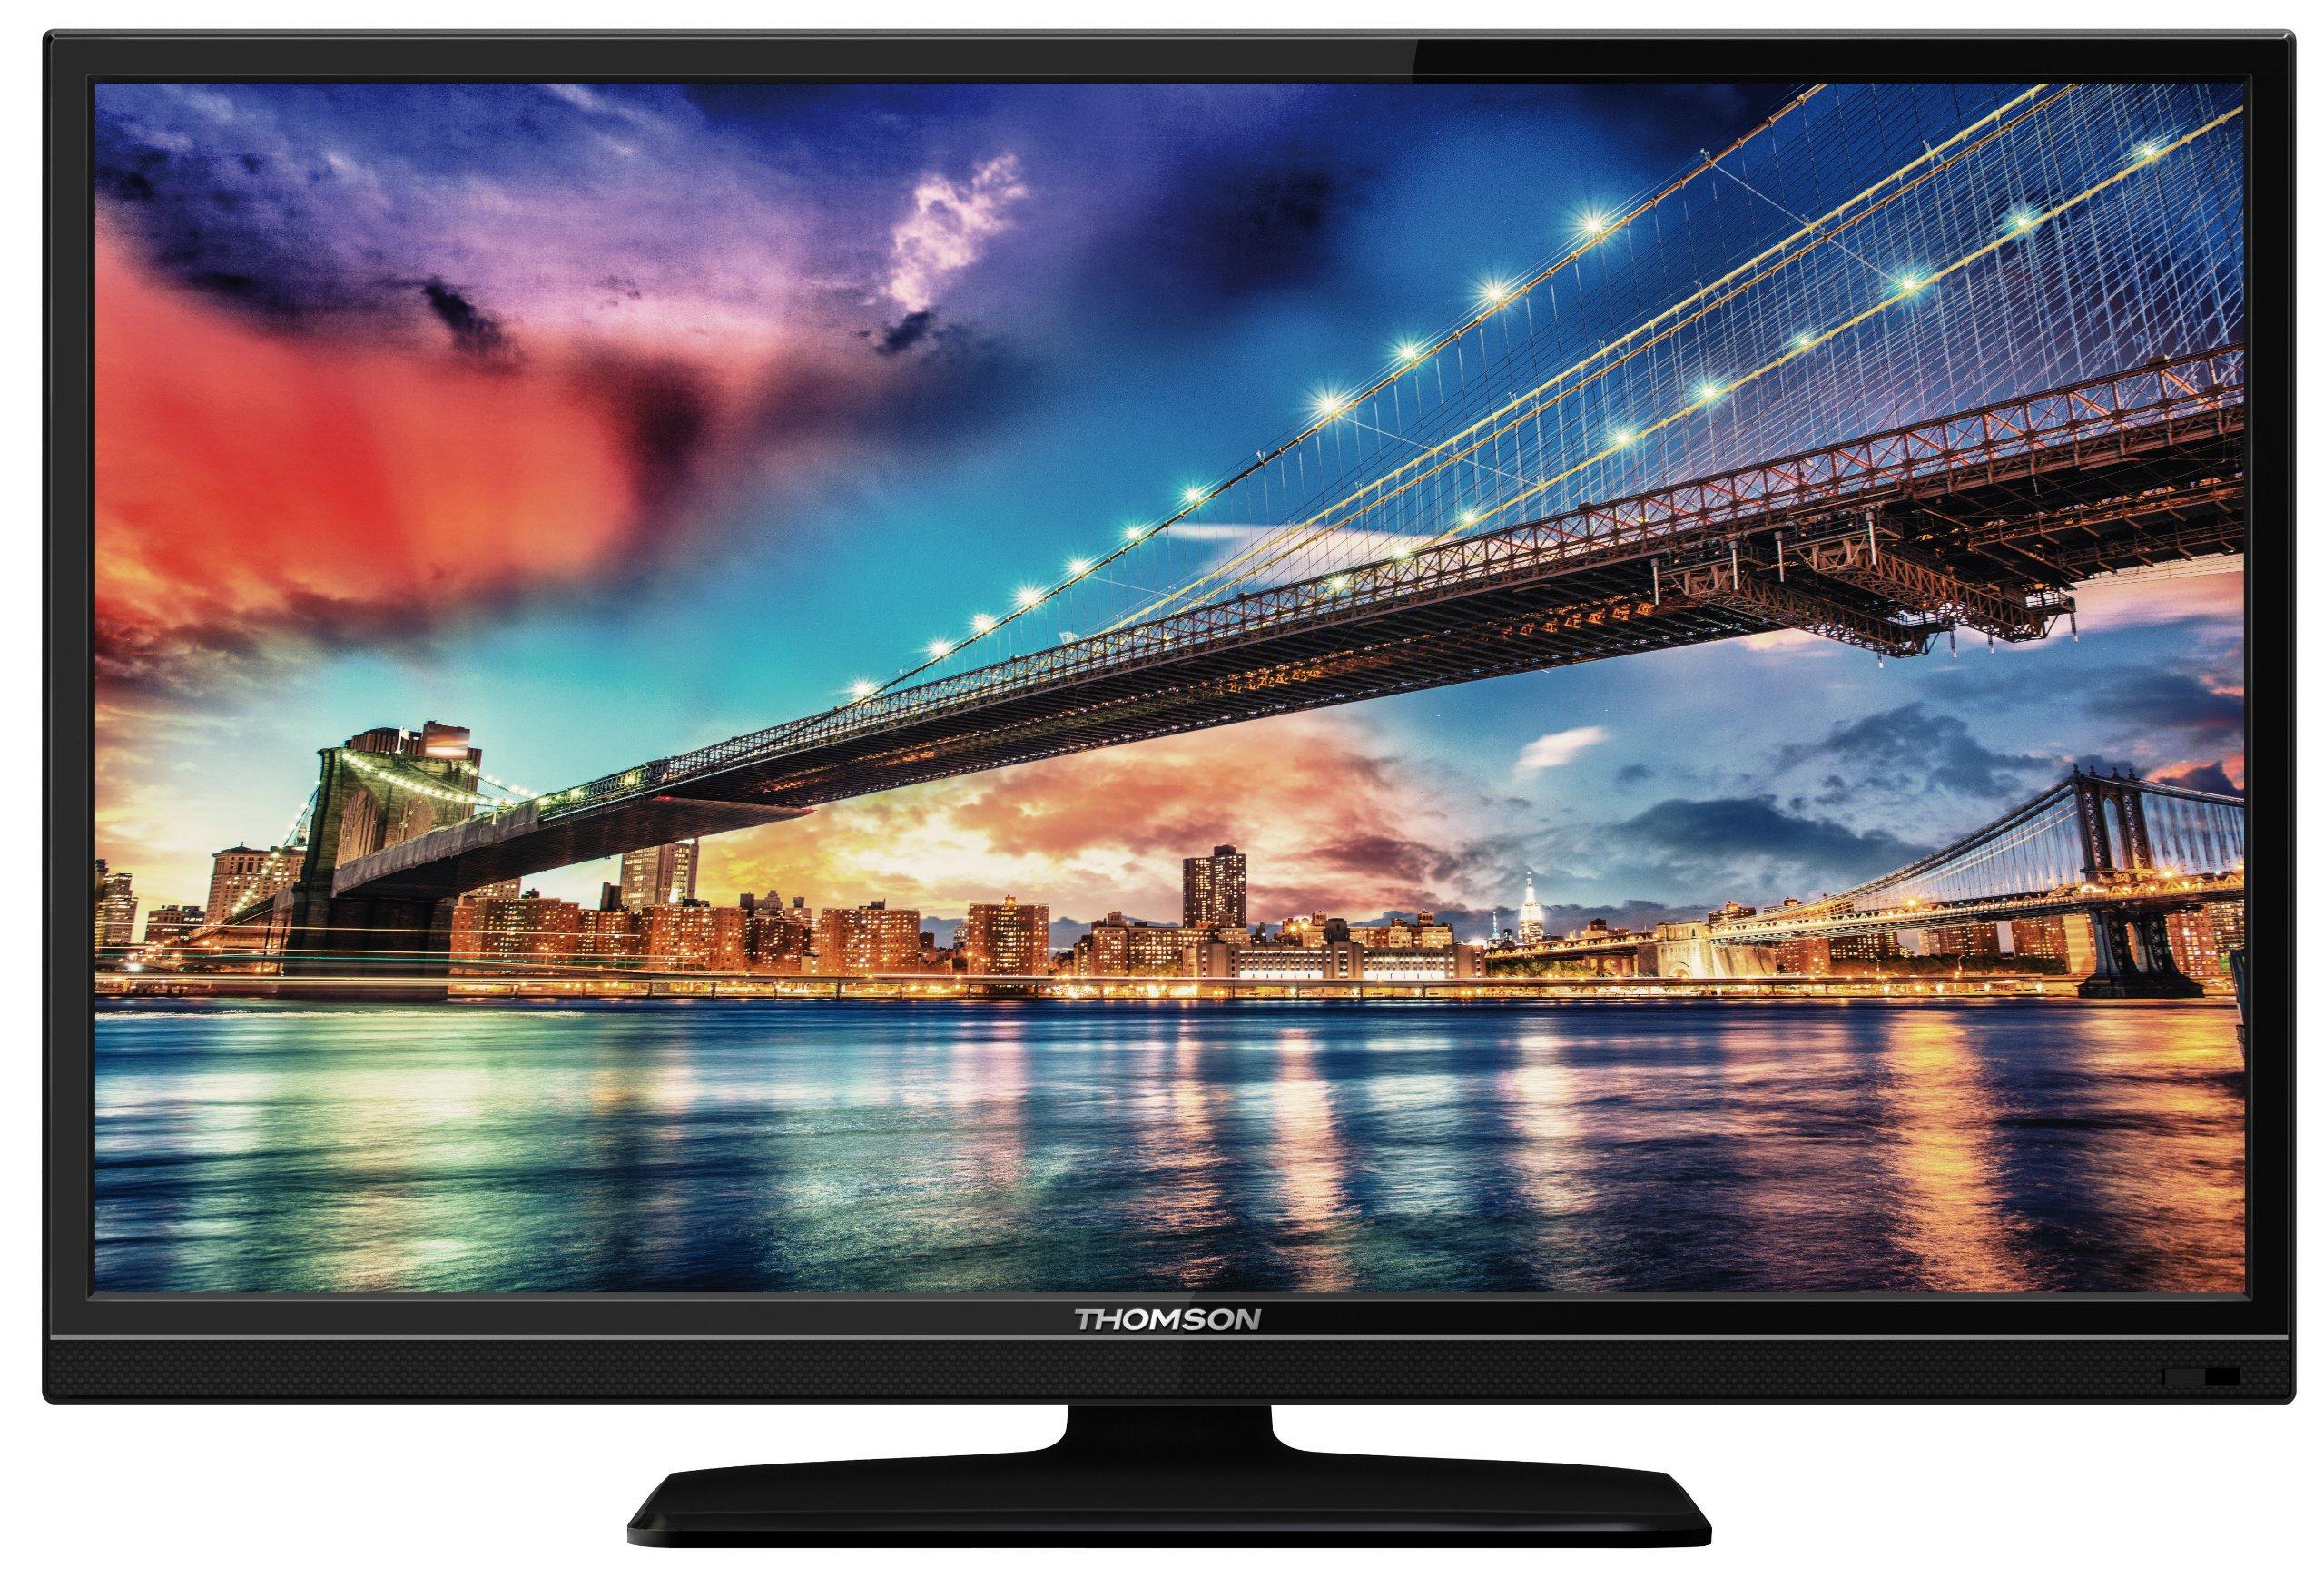 Thomson 32HU3253C/G LED TV - Televisor (81,28 cm (32